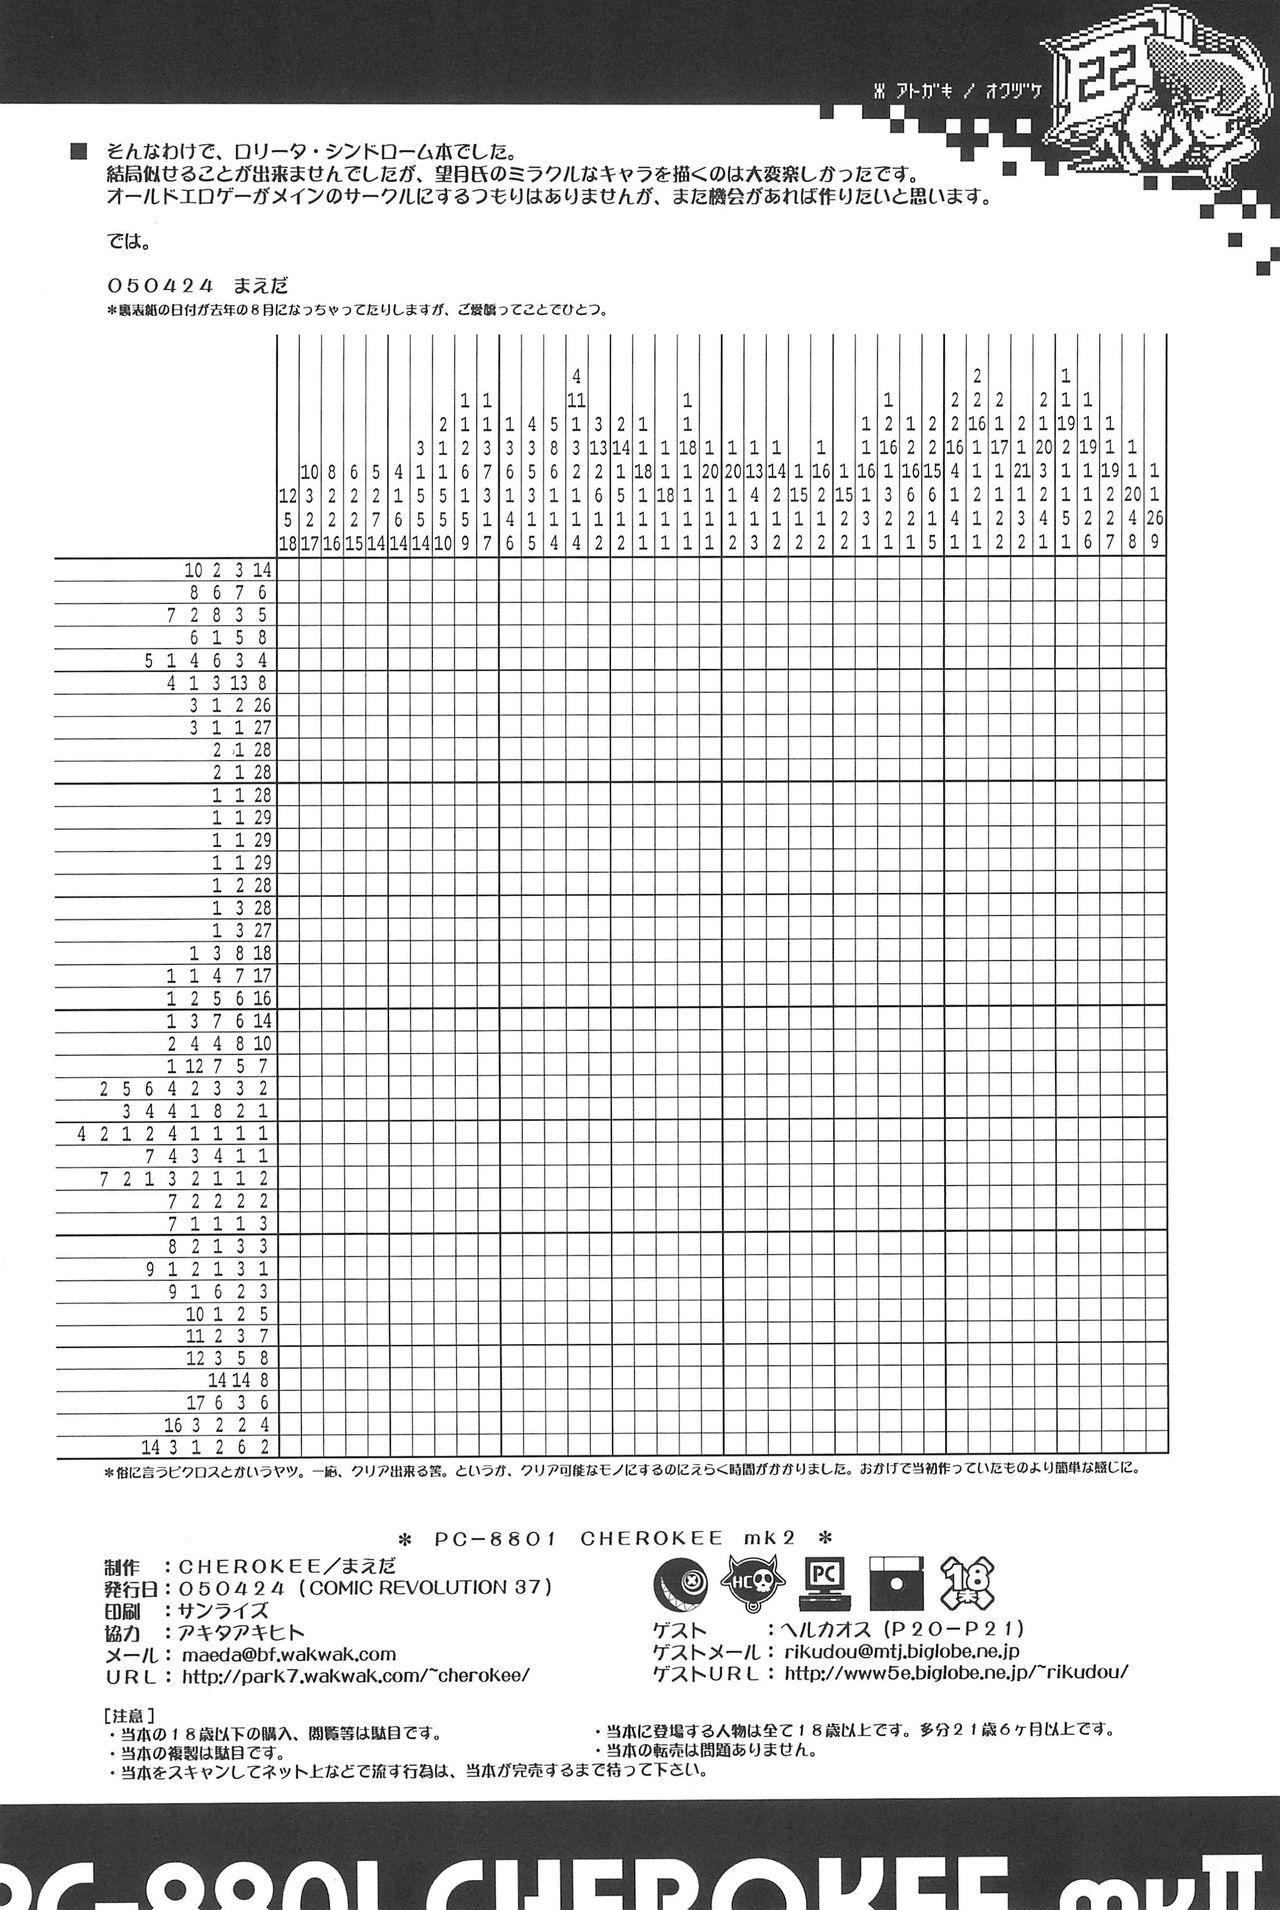 PC-8801 CHEROKEE mk2 21